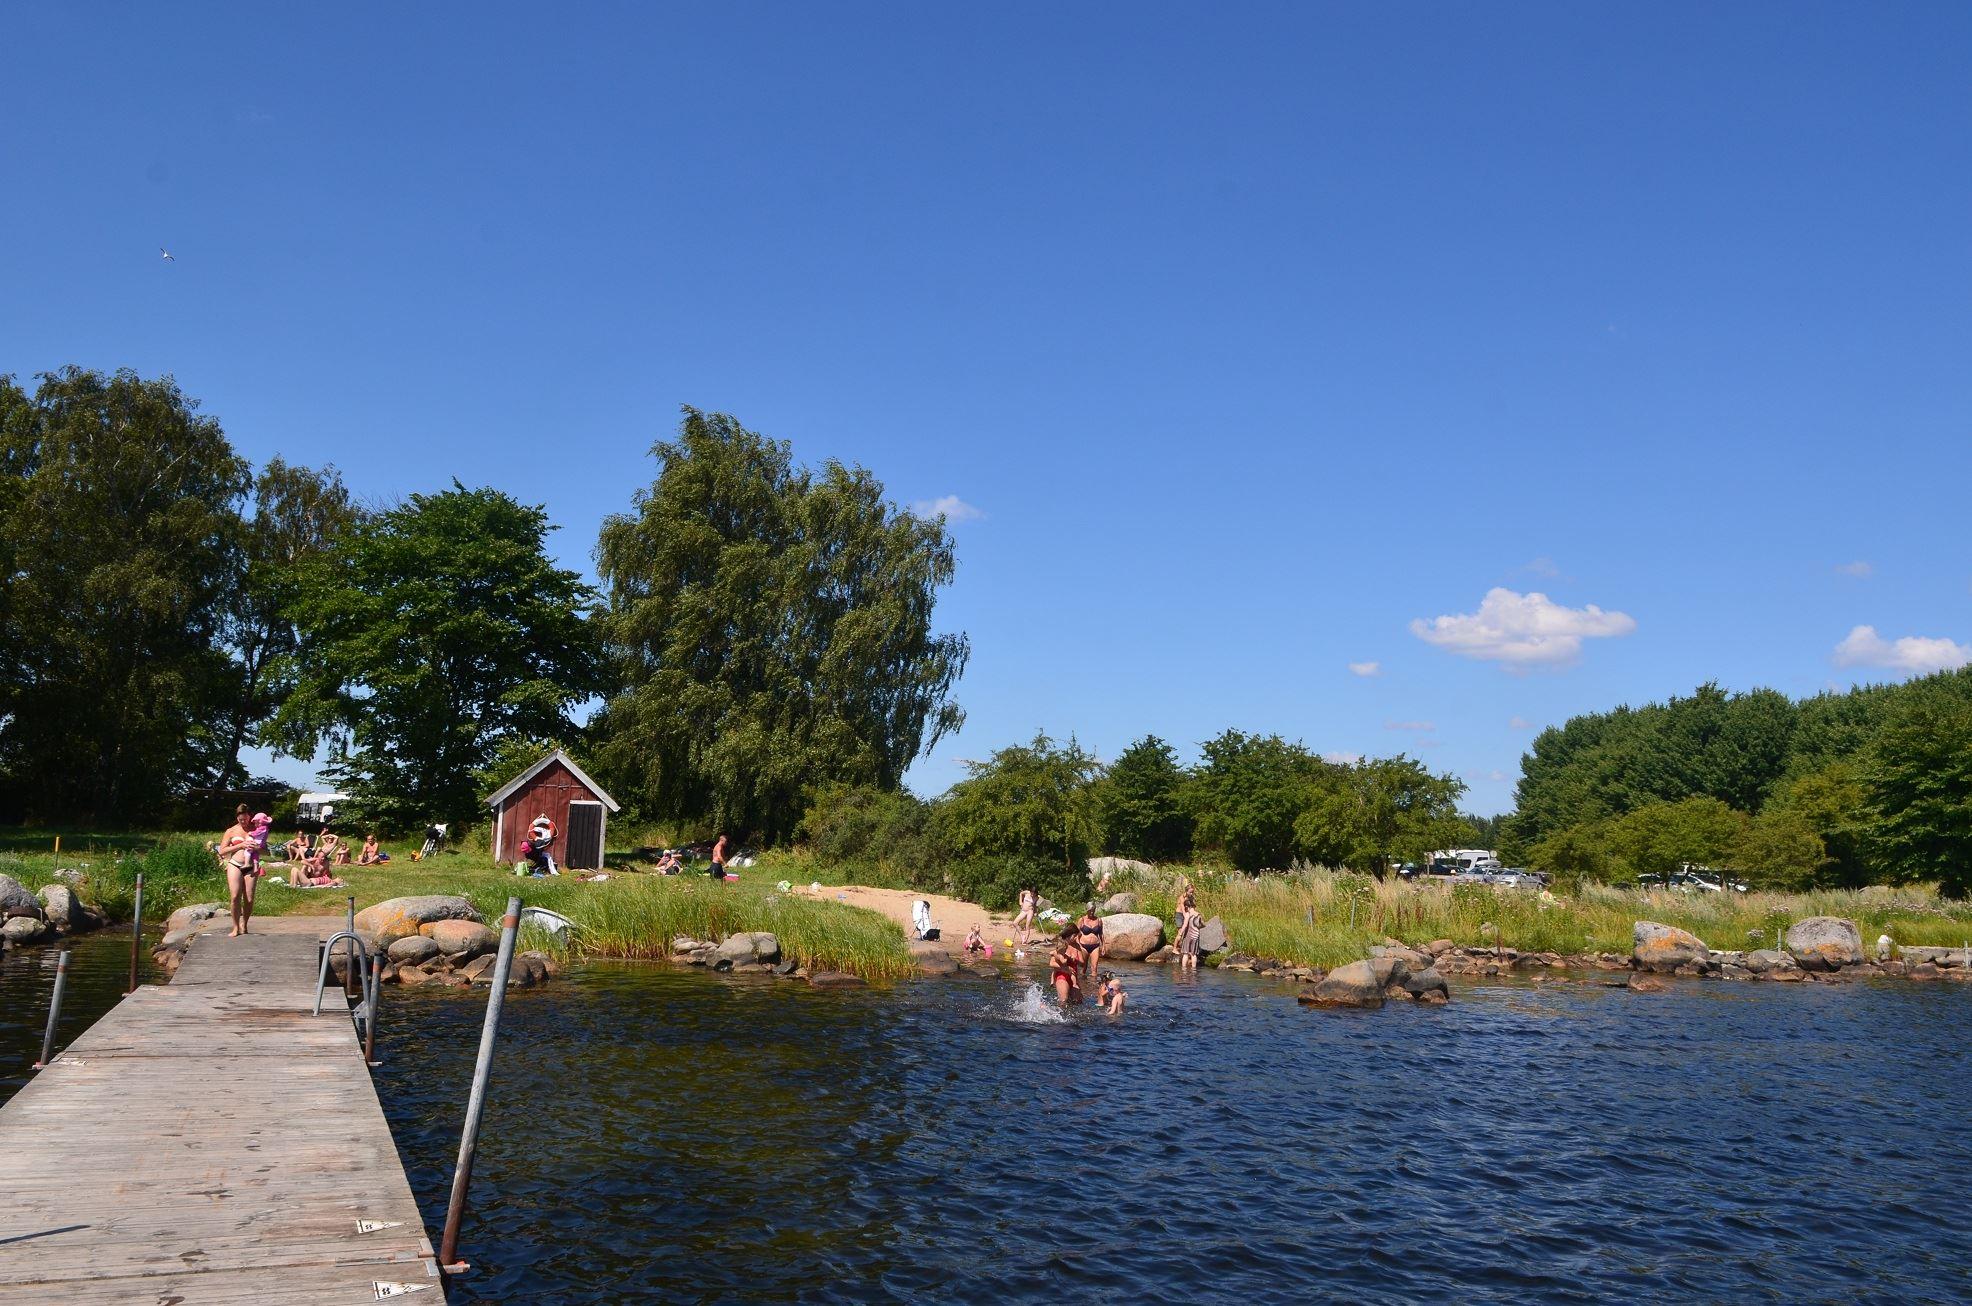 Tobias Delfin, Tomsabo badplats, Edenryd